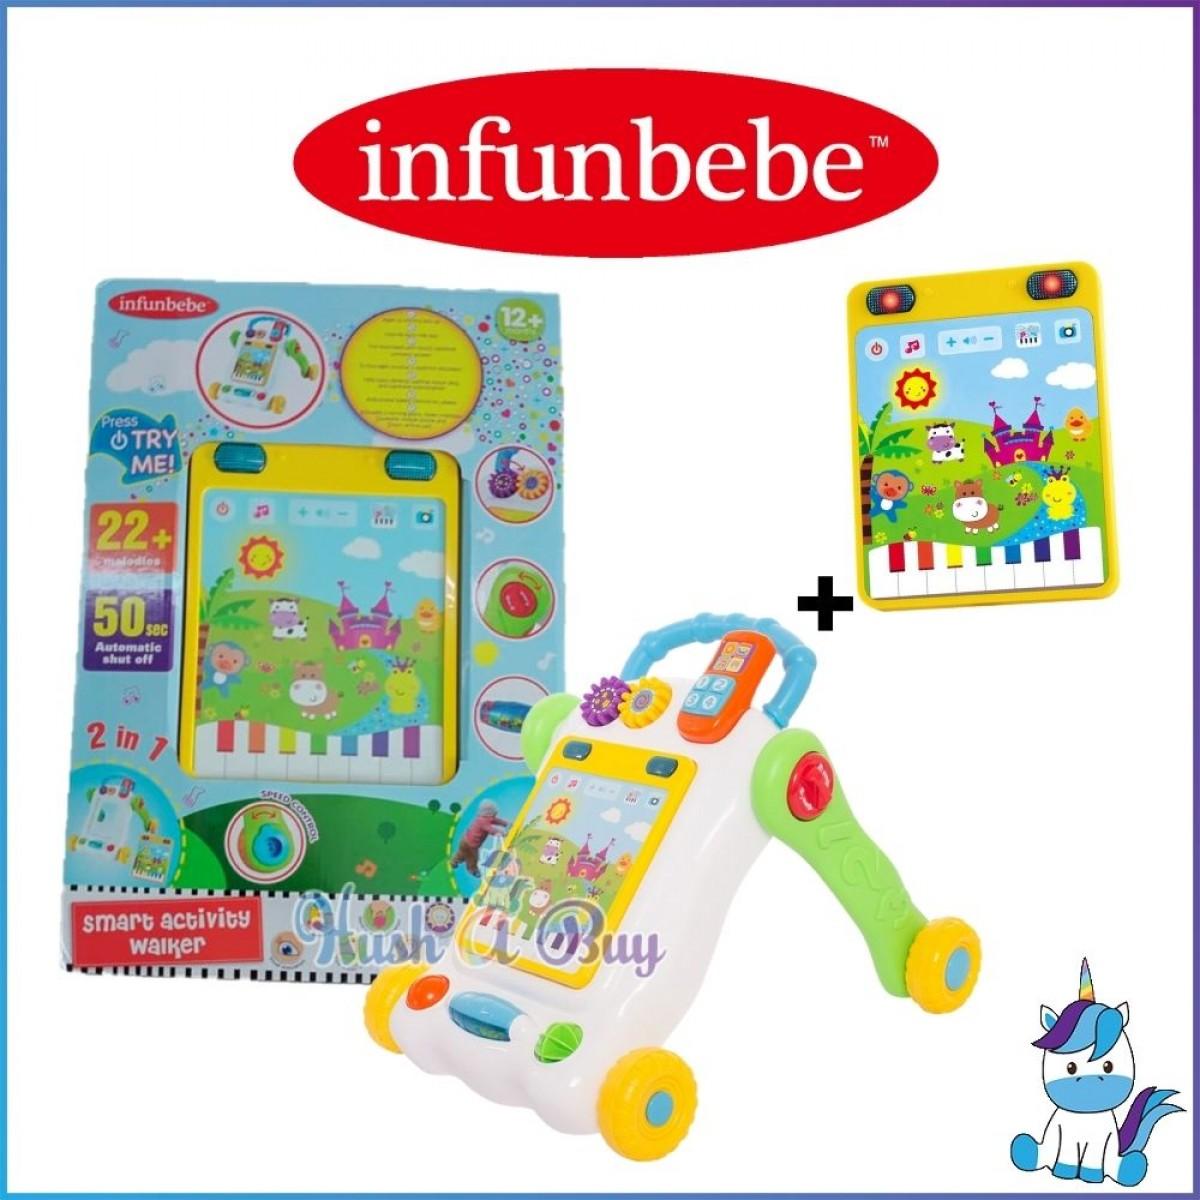 Infunbebe Activity Walker for Children 12m+ : Shape Sorter / Ball Run / Smart Activity